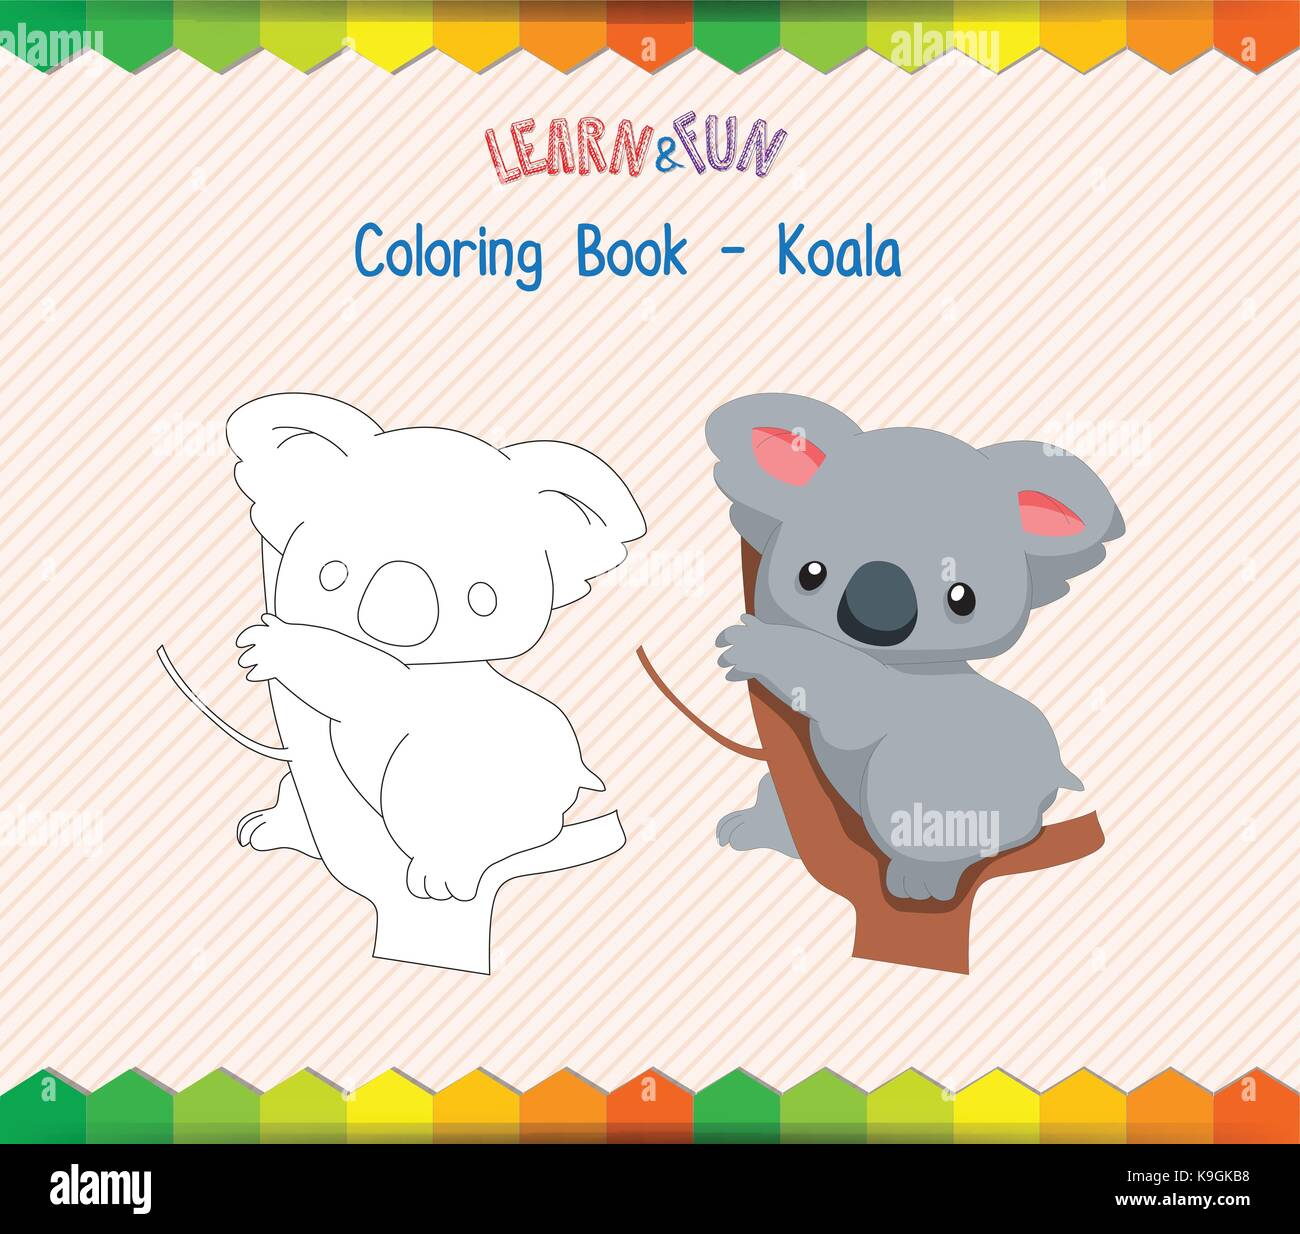 Cartoon Koala Animal Outline Vector Imágenes De Stock & Cartoon ...